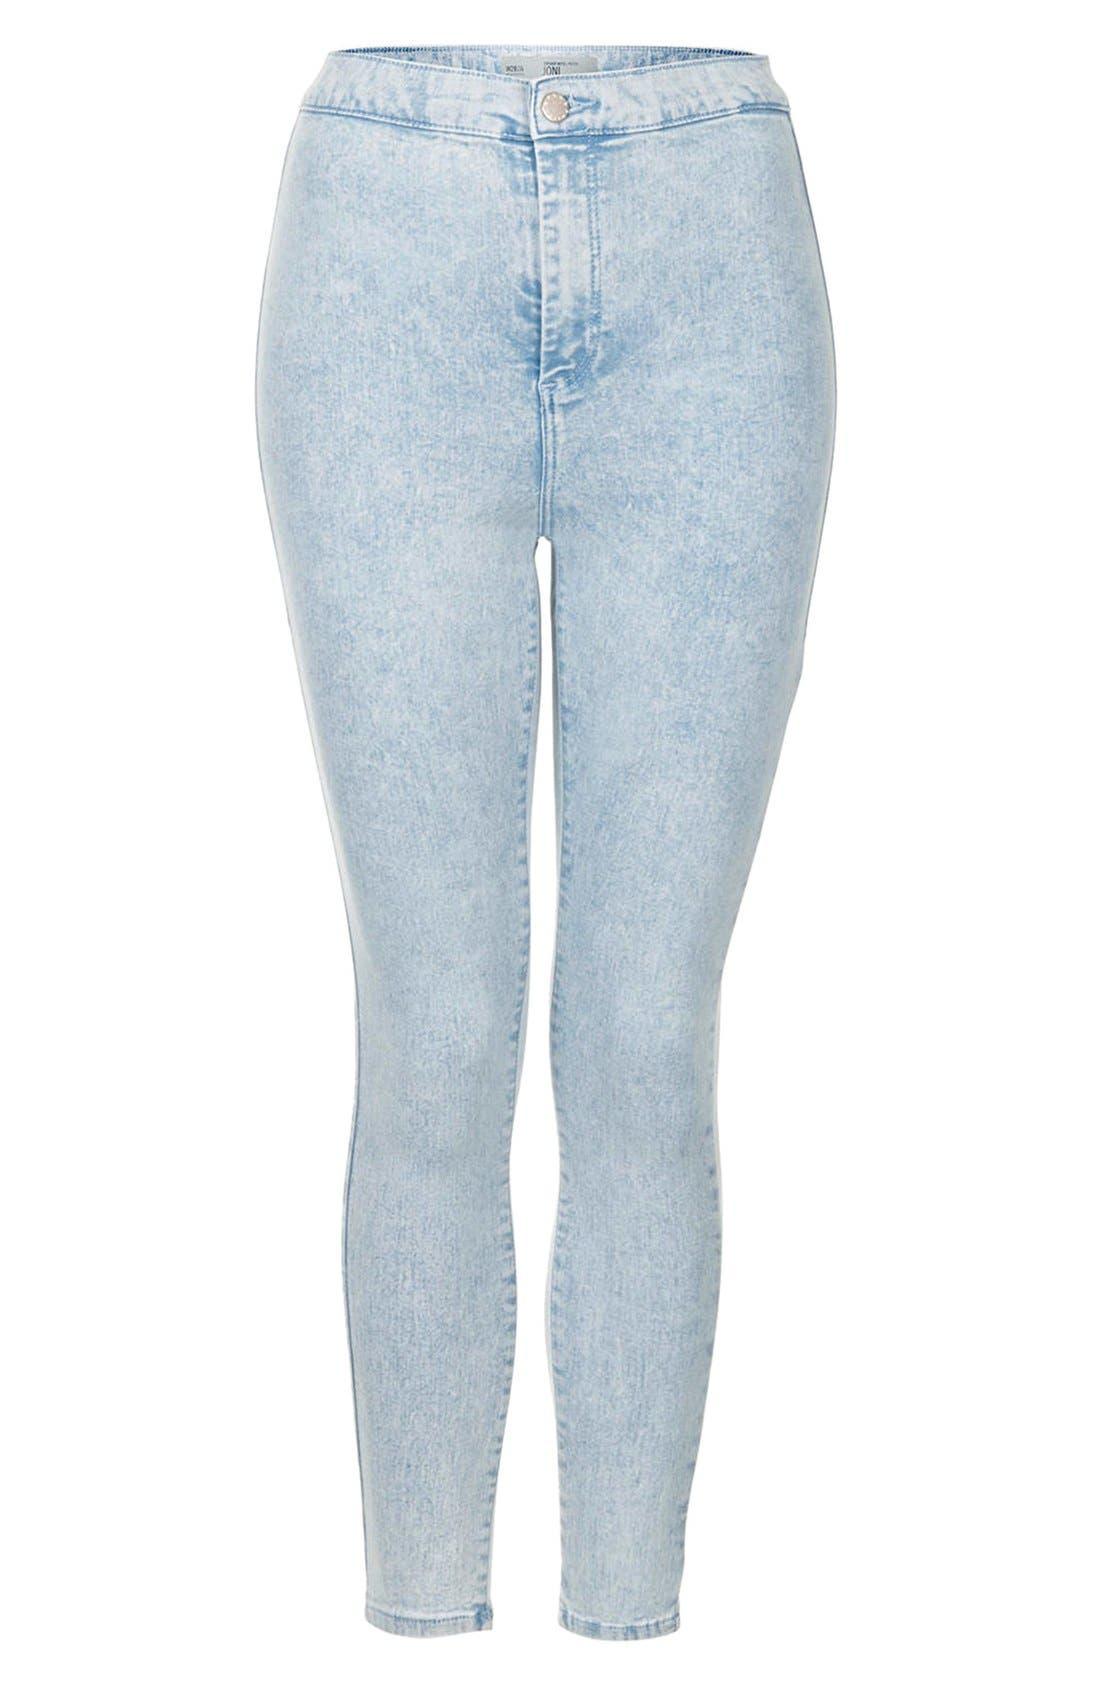 Alternate Image 3  - Topshop 'Joni' Mottled Ultra Skinny Jeans (Bleach Stone)